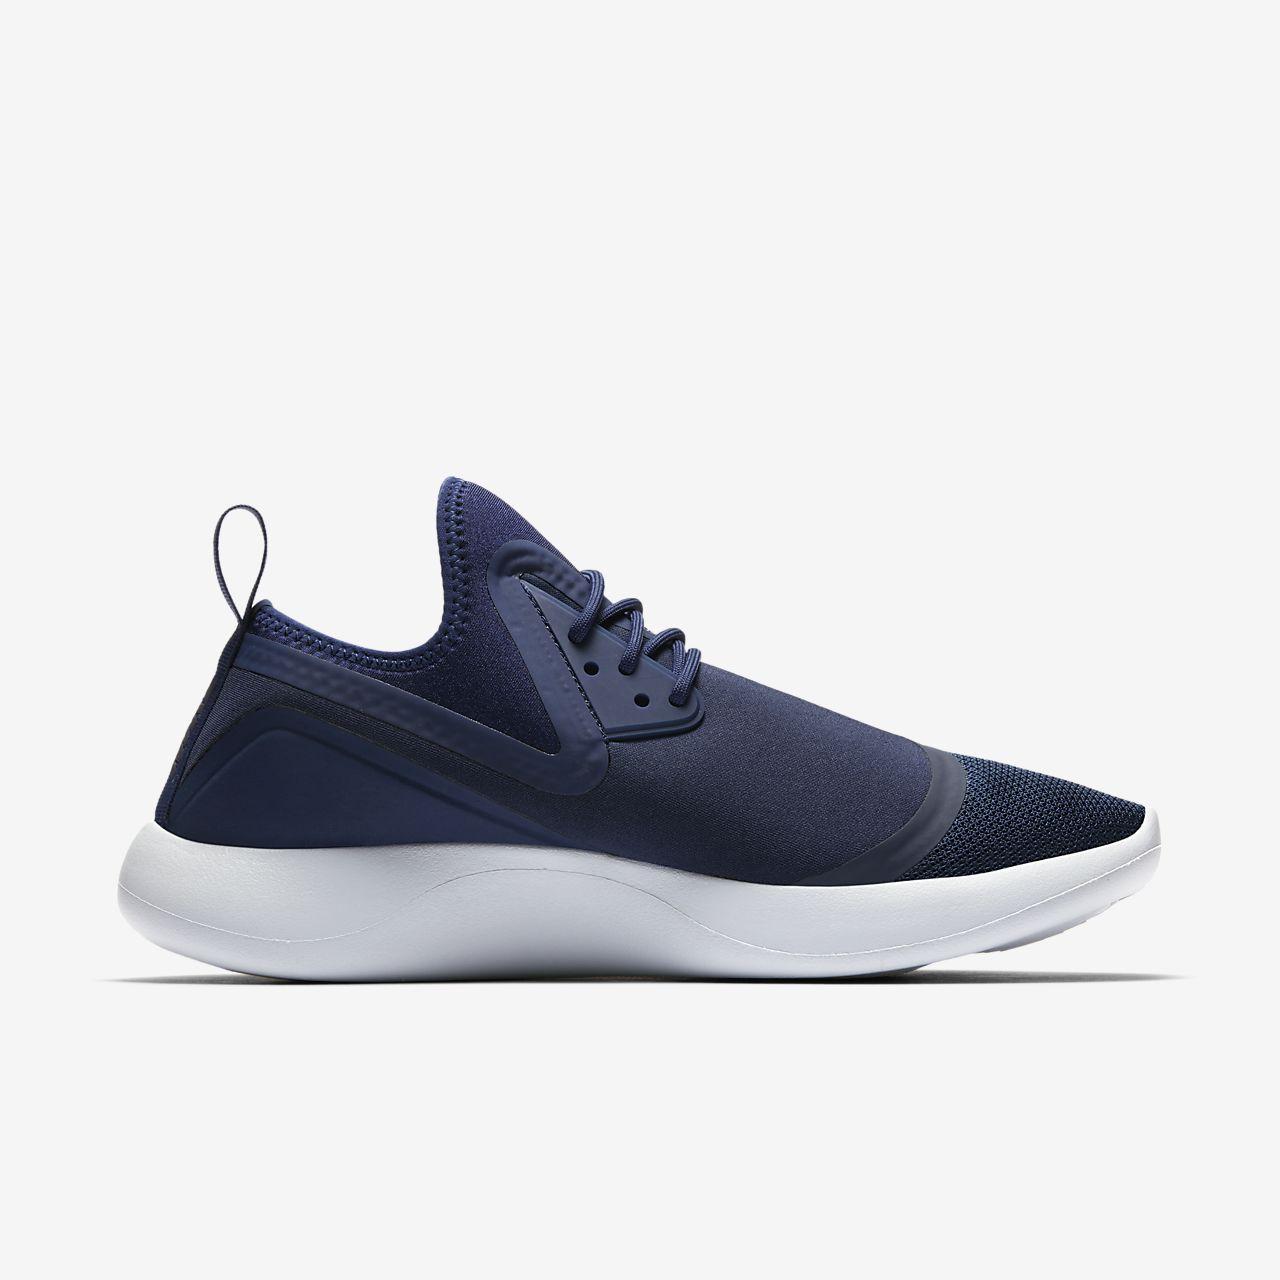 nike lunarcharge prix,Nike LunarCharge Essential Triple Black